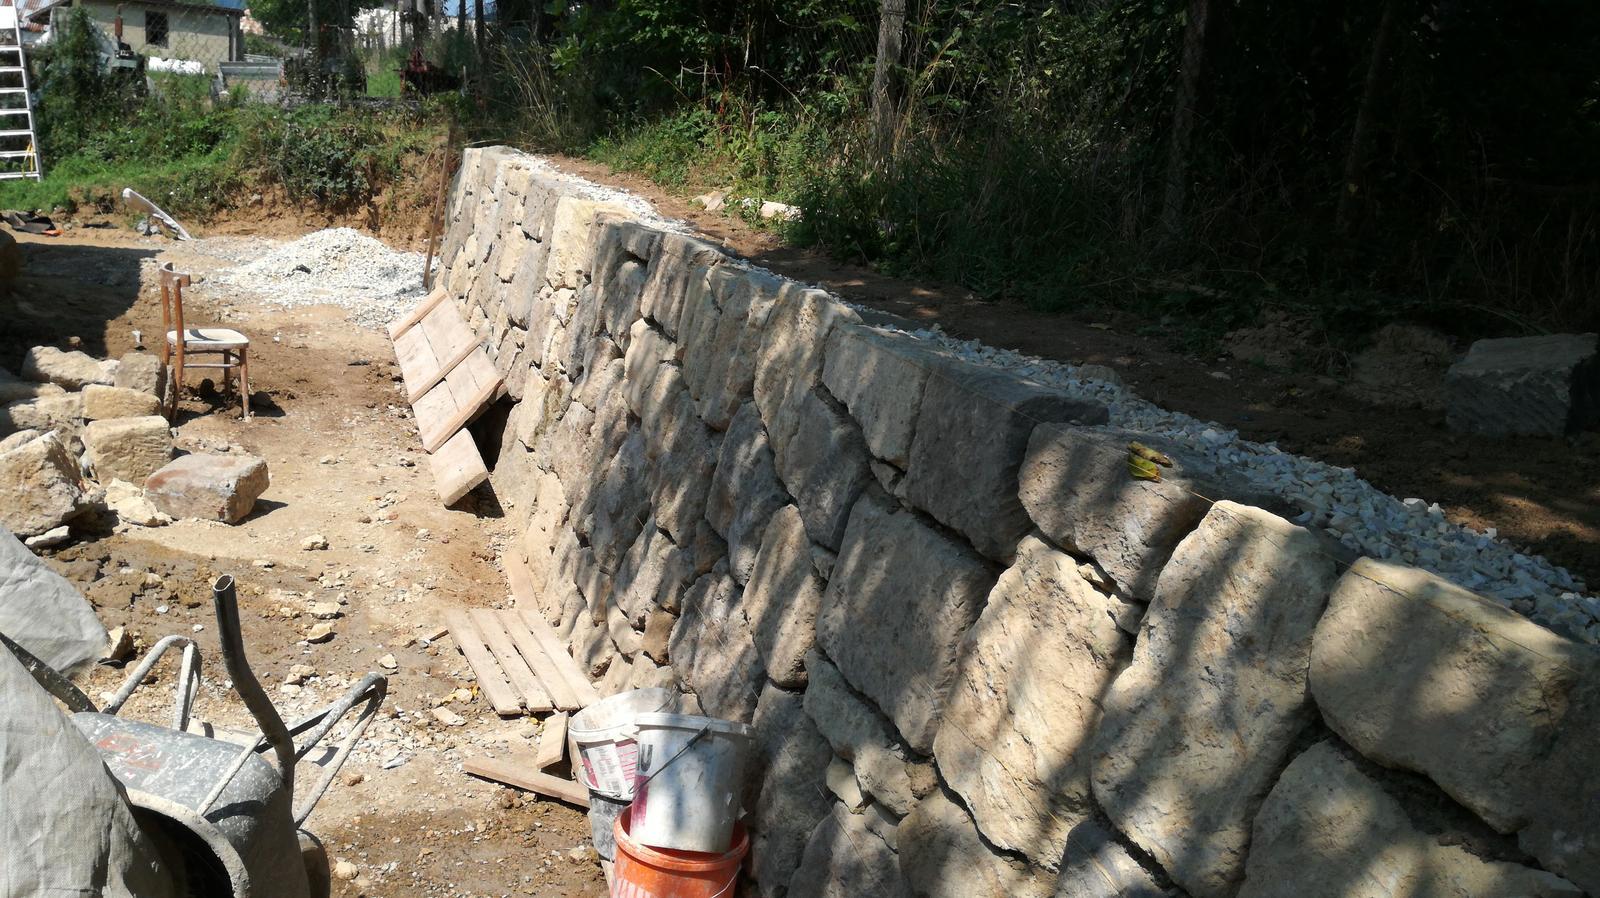 HACIENDA NAPOLI SEBECHLEBY - kamos zbural stary dom...skoda ten kamen vyhodil len tak do cesty.tak sme postavili oporny mur